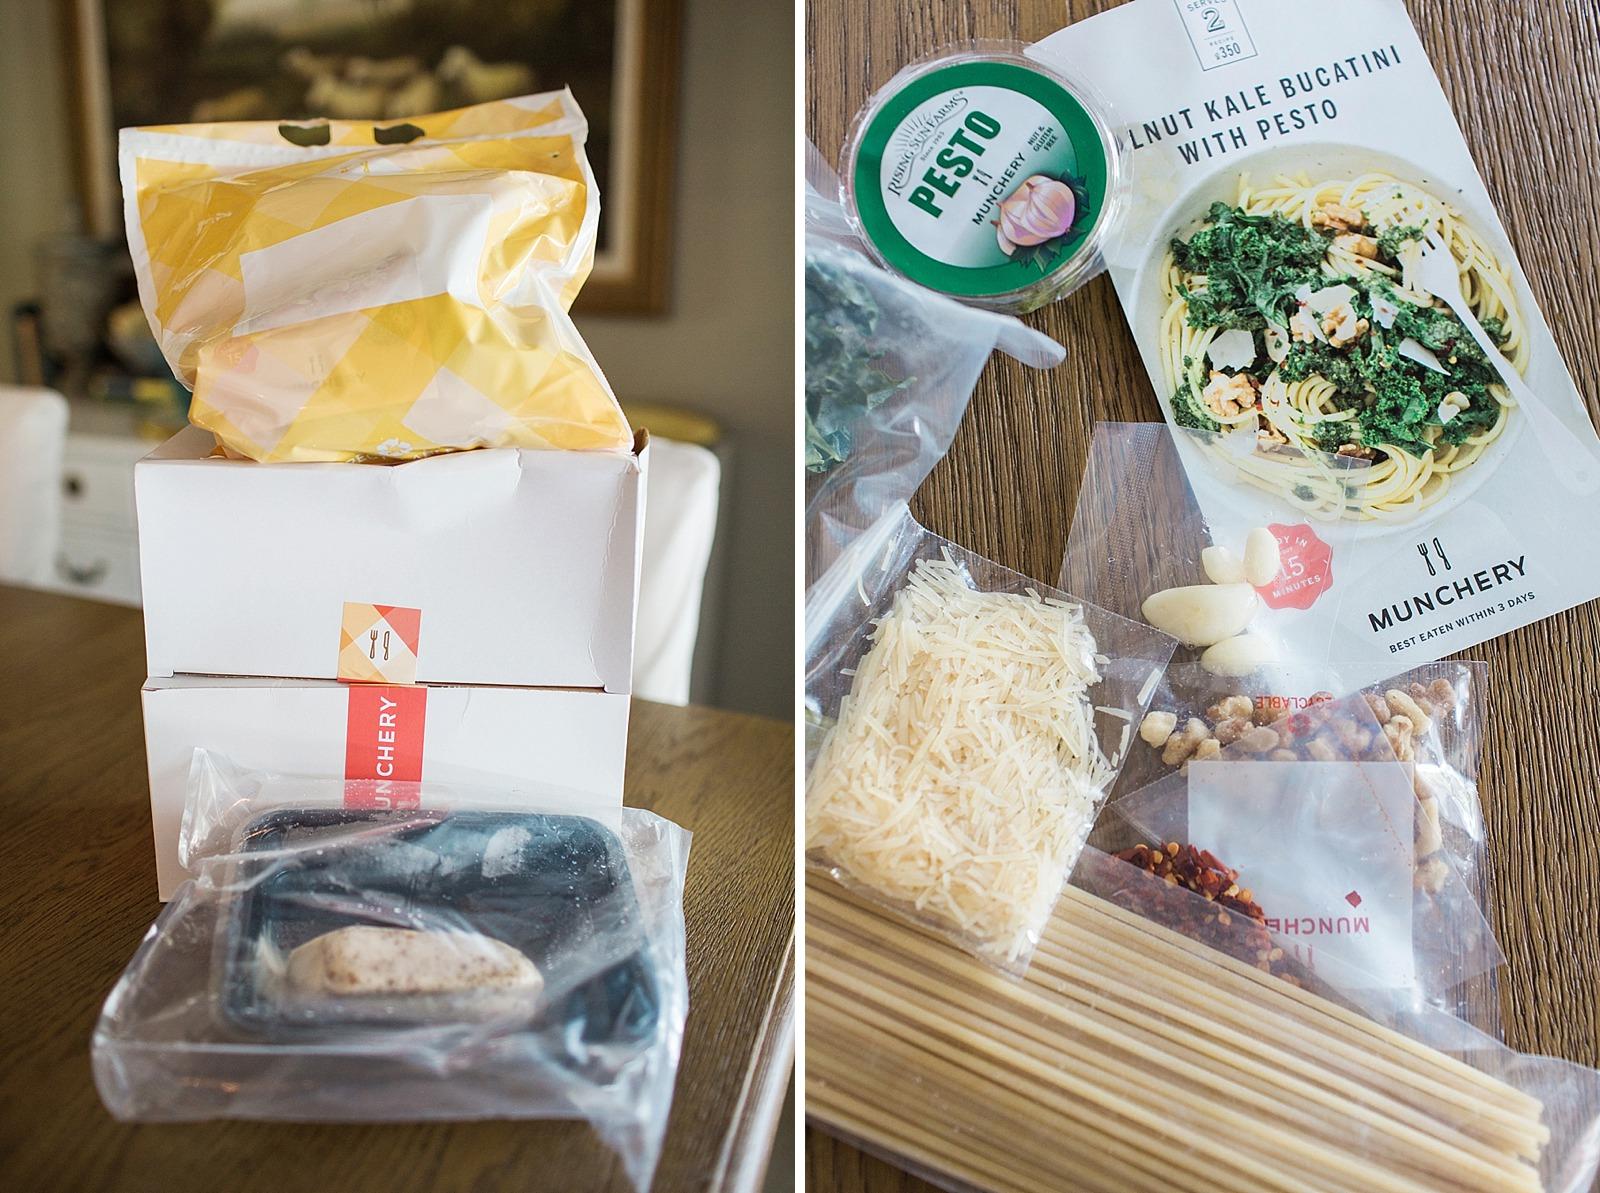 diana-elizabeth-blog-travel-fashion-blogger-phoenix-arizona-munchery-food-delivery-review_0009